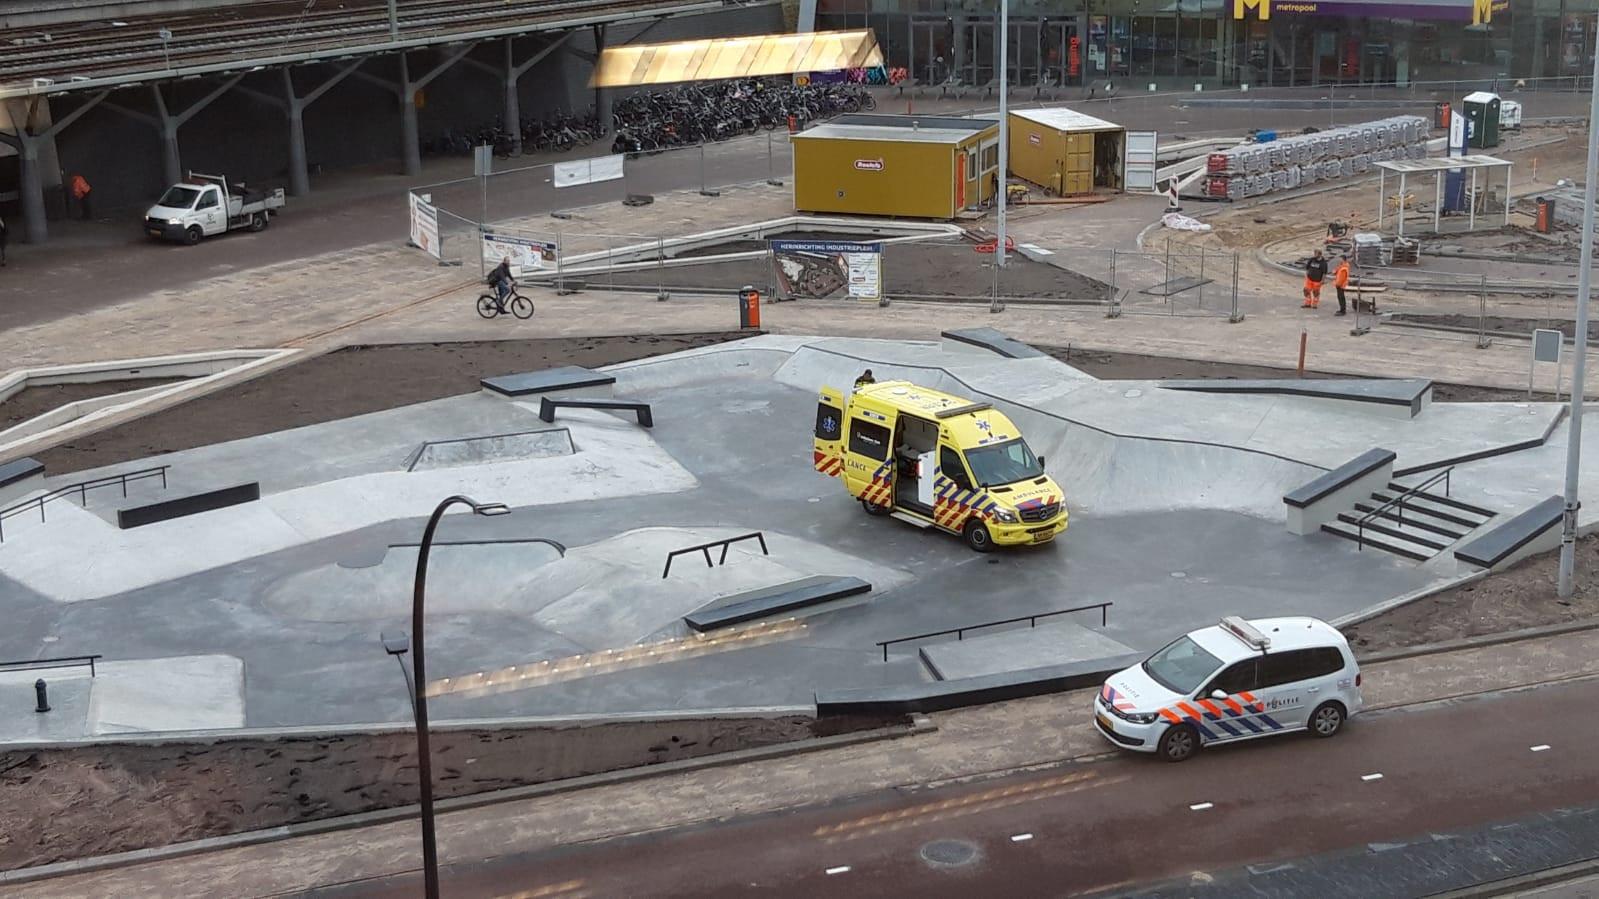 De gewonde skater werd per ambulance afgevoerd.